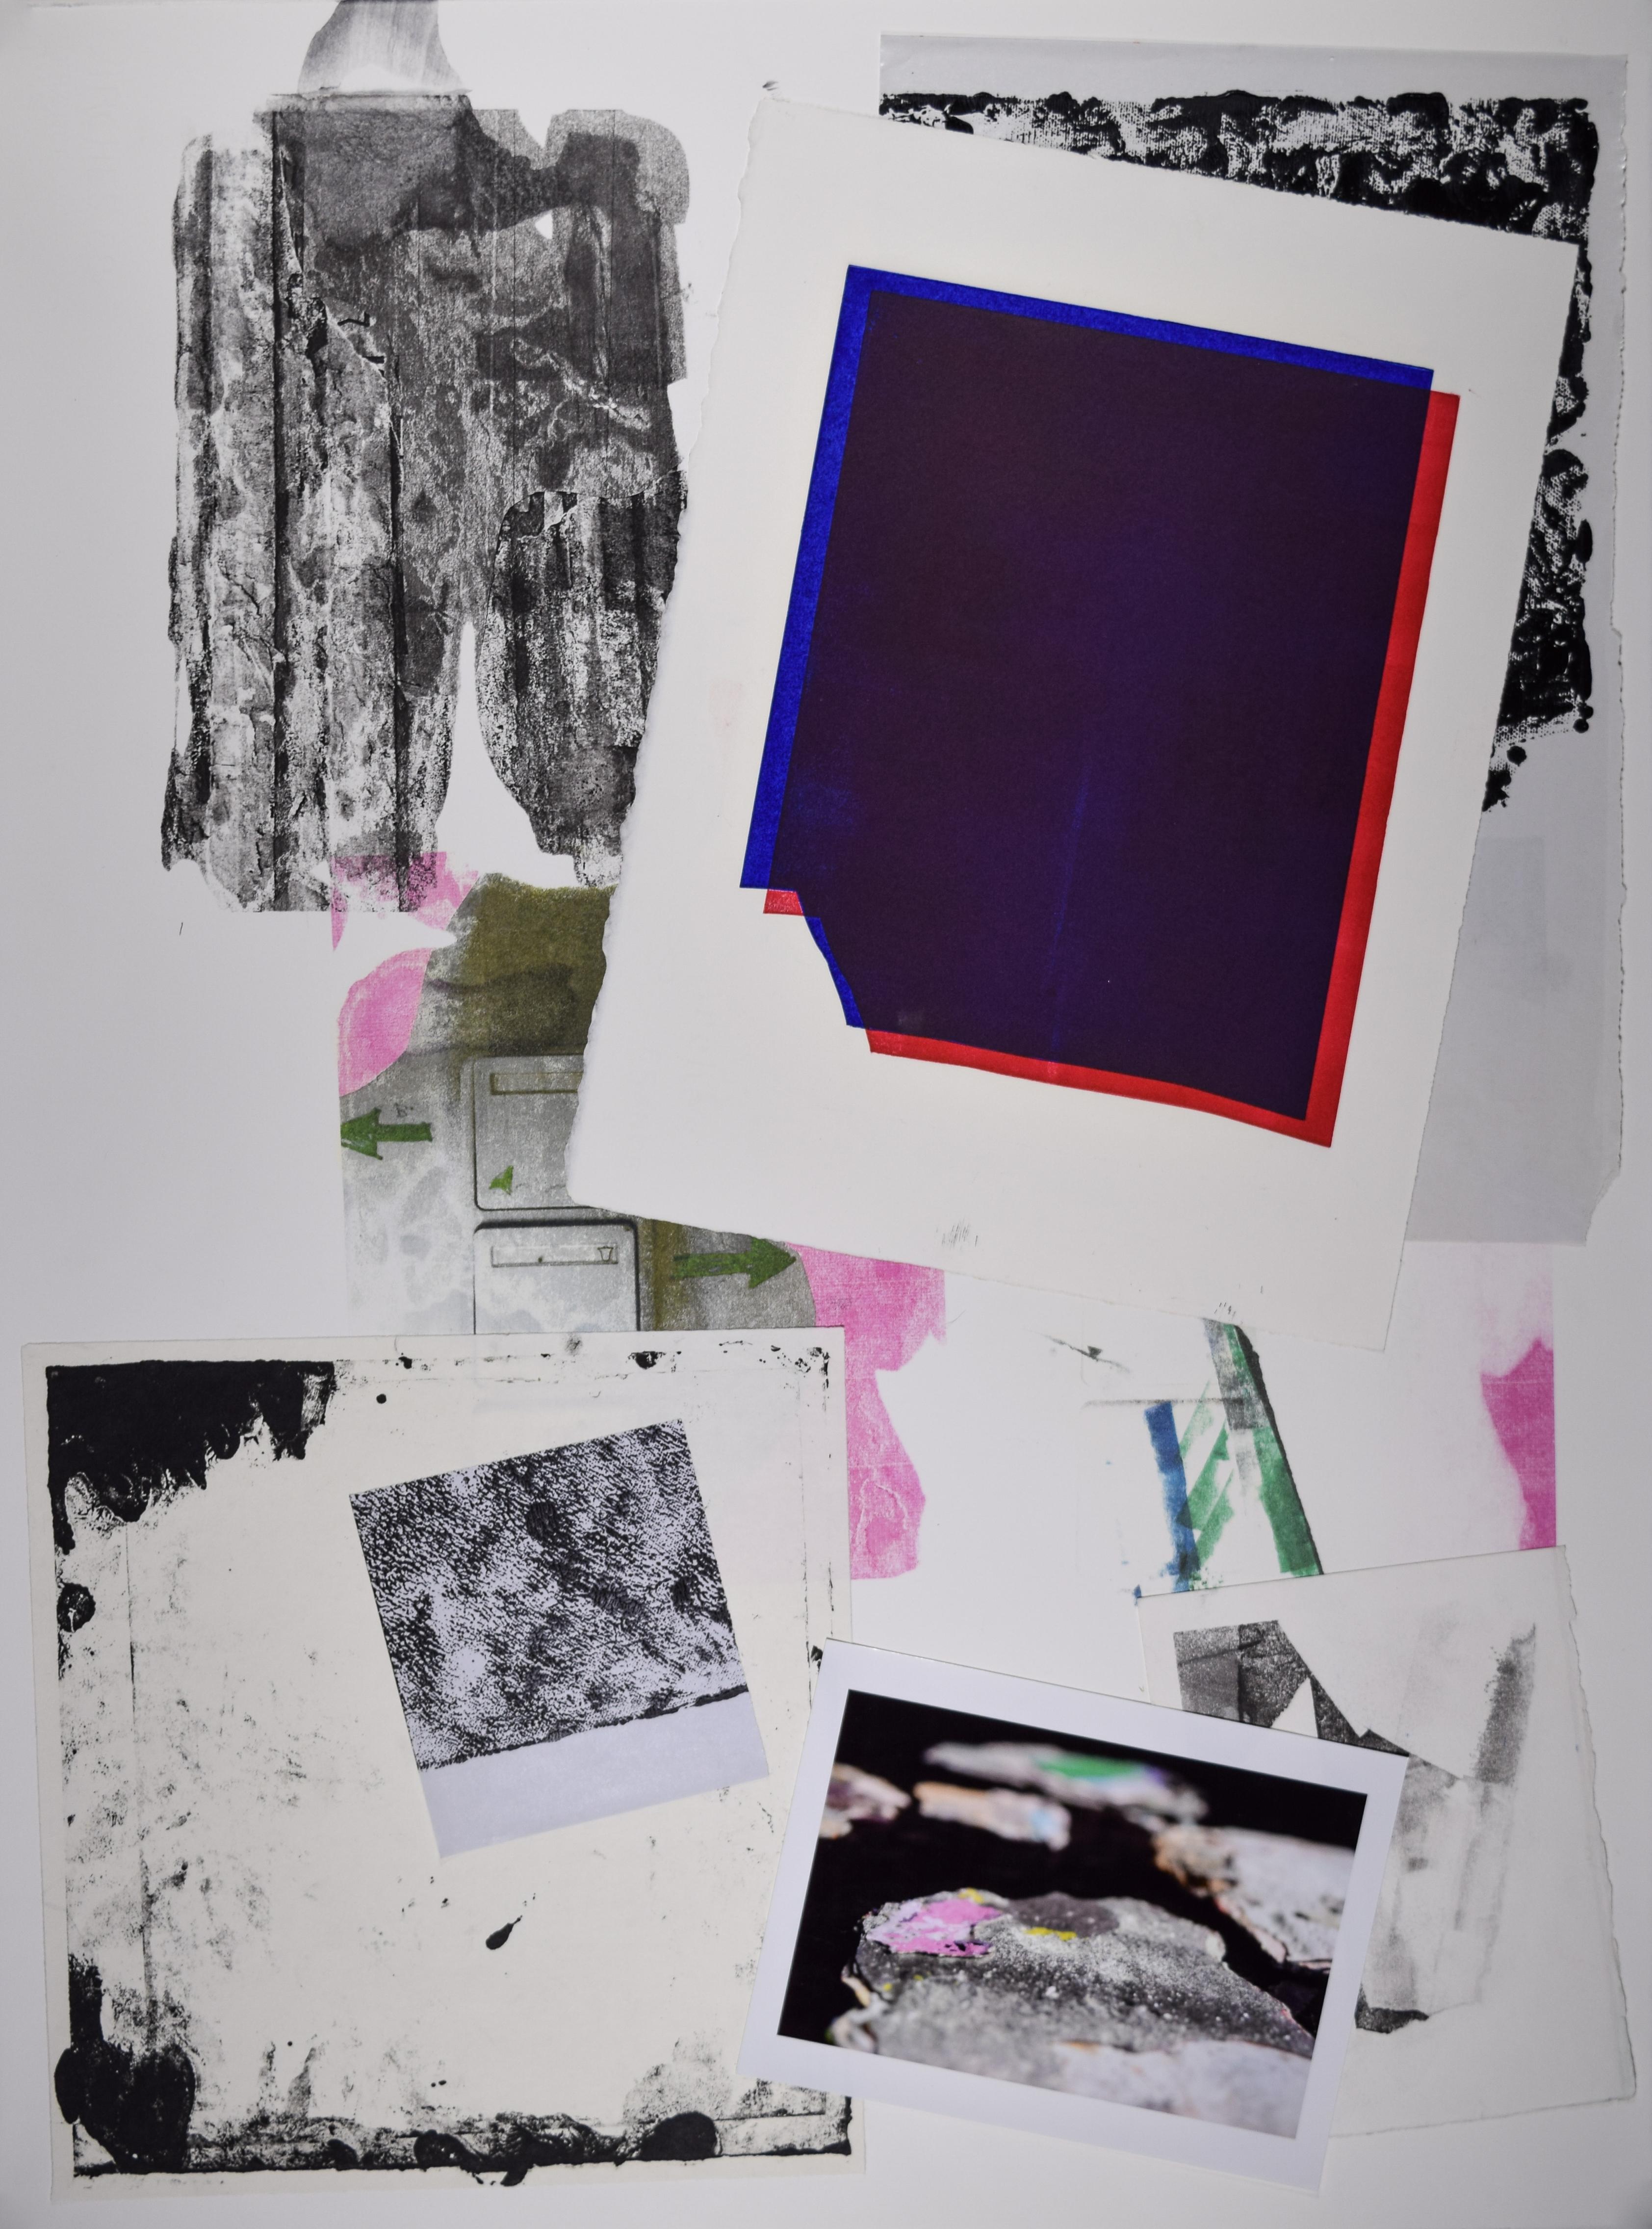 KJ Schumacher, Untitled (c024), mixed media collage, 30 x 22 in, 2020